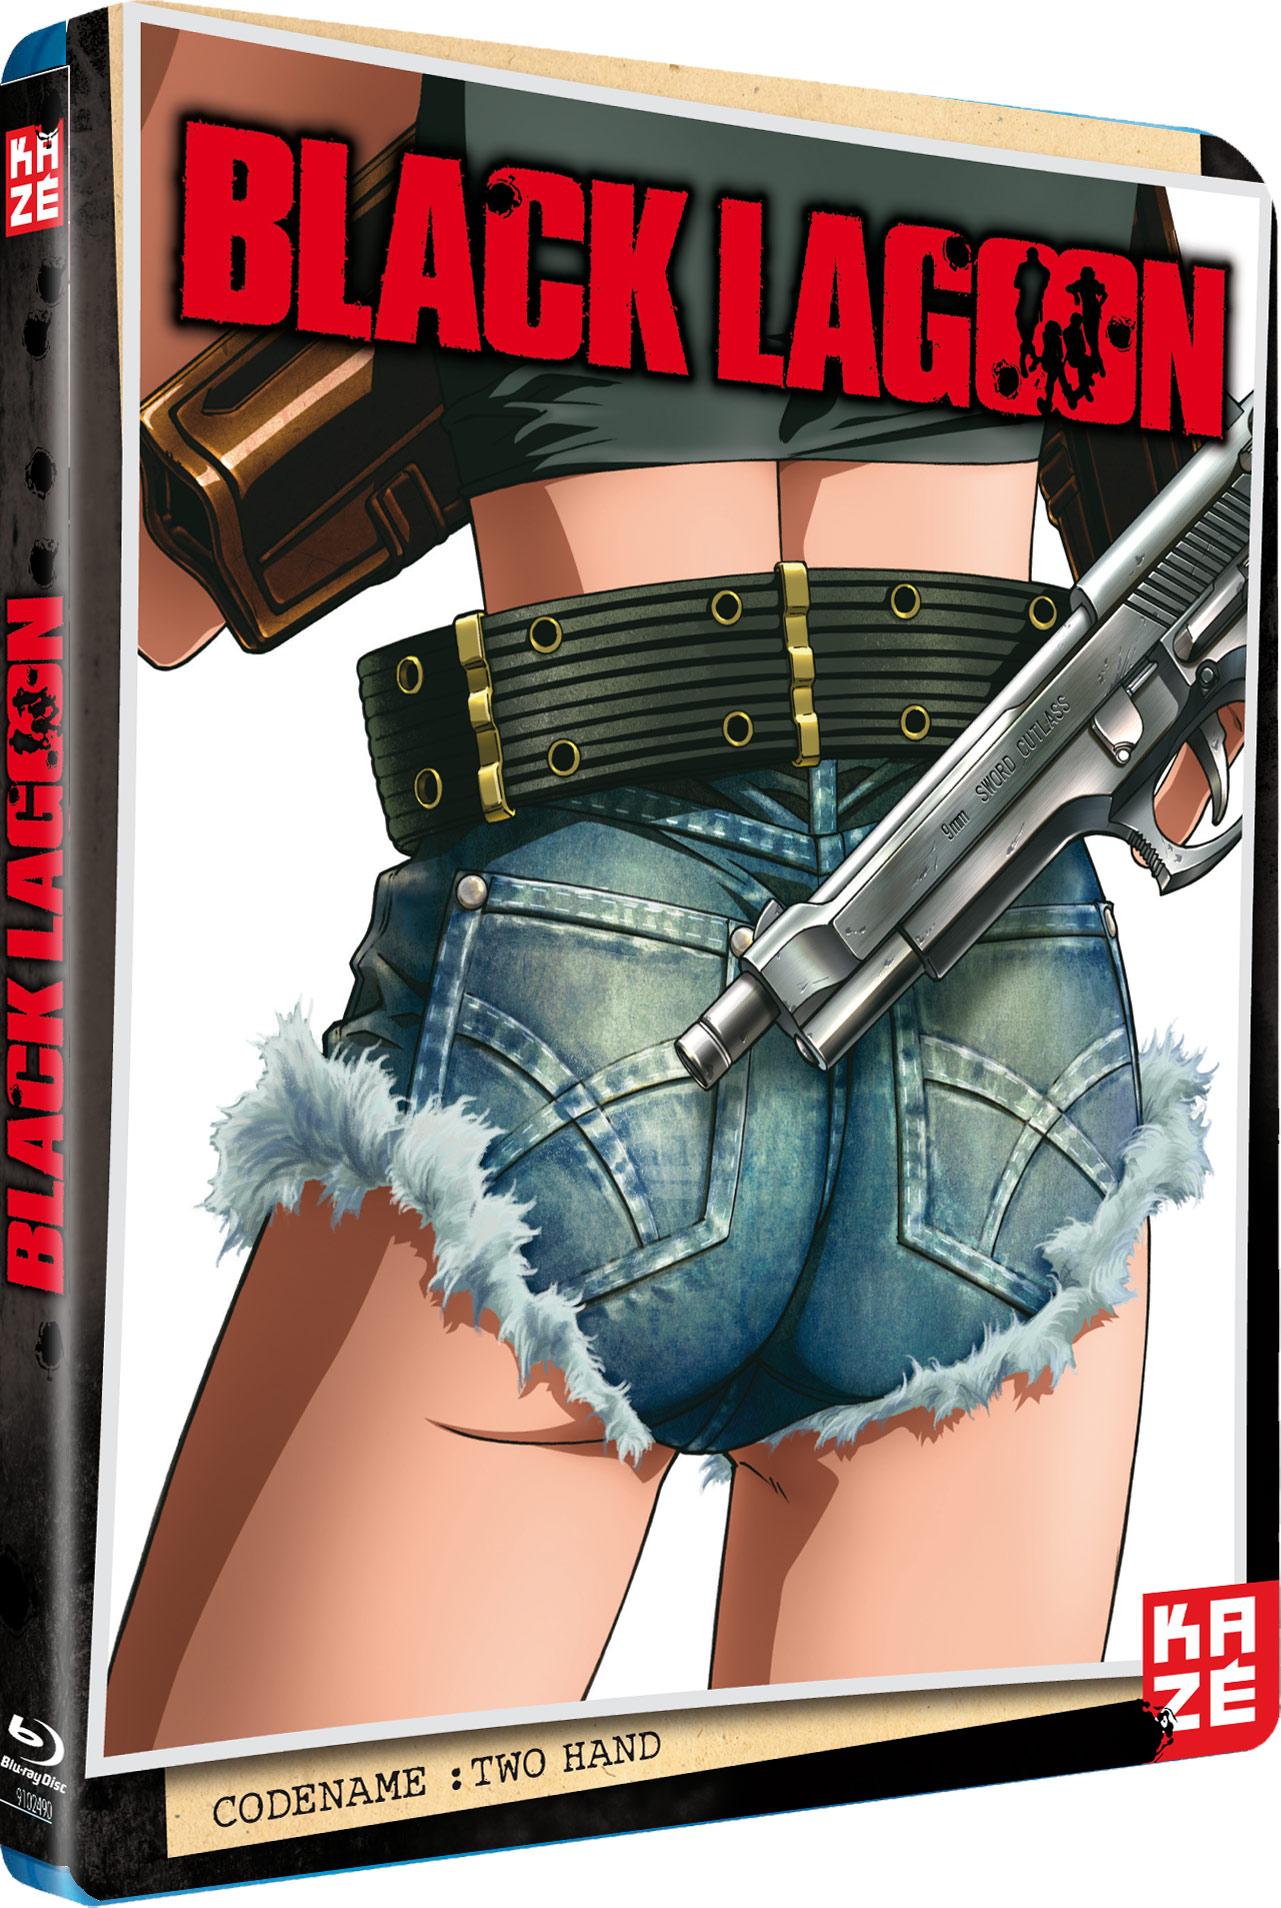 Black Lagoon Serie 1 Blu-Ray Kazè